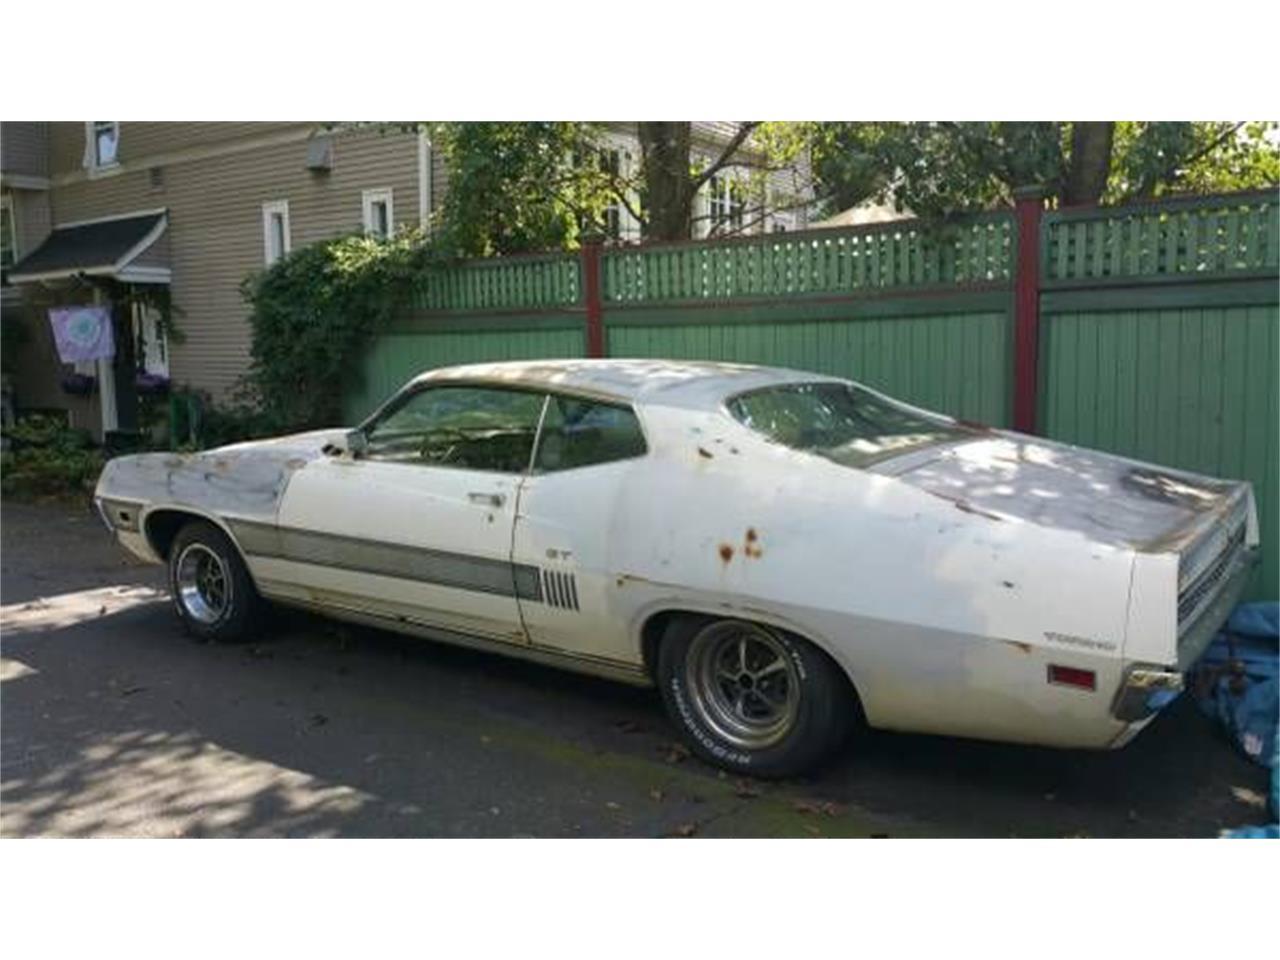 1970 ford gran torino for sale classiccars com cc 1161028large picture of \u002770 gran torino ovus